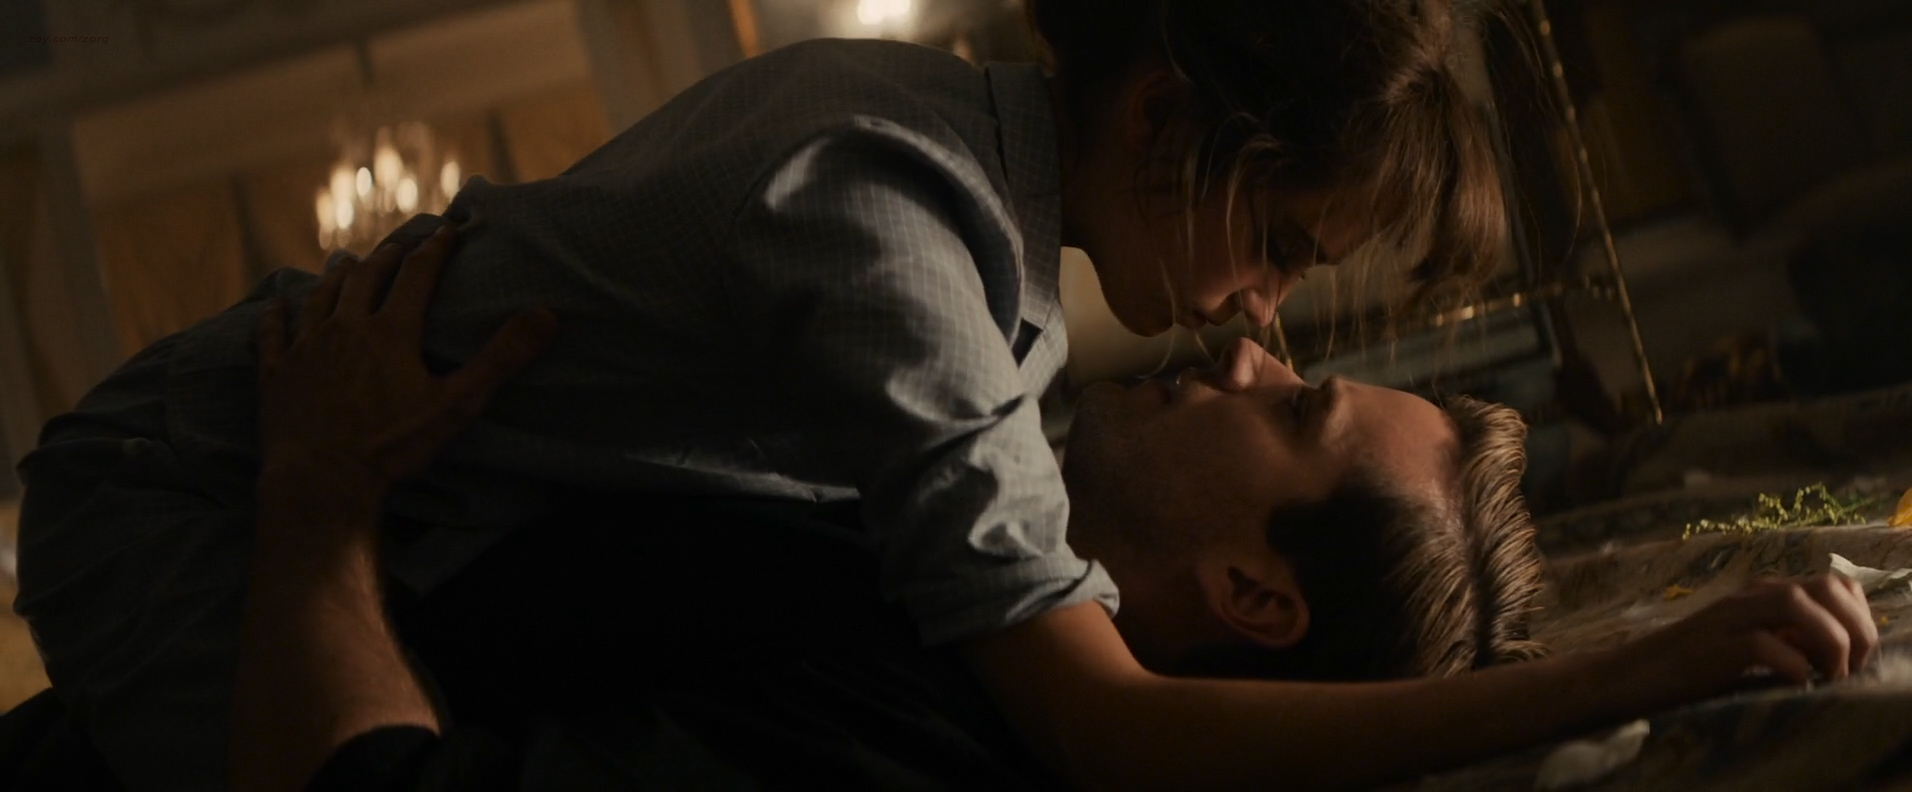 Alicia Vikander hot and sexy and unaccredited butt see through - The Man from U.N.C.L.E. (2015) HD 1080p Web-Dl (3)